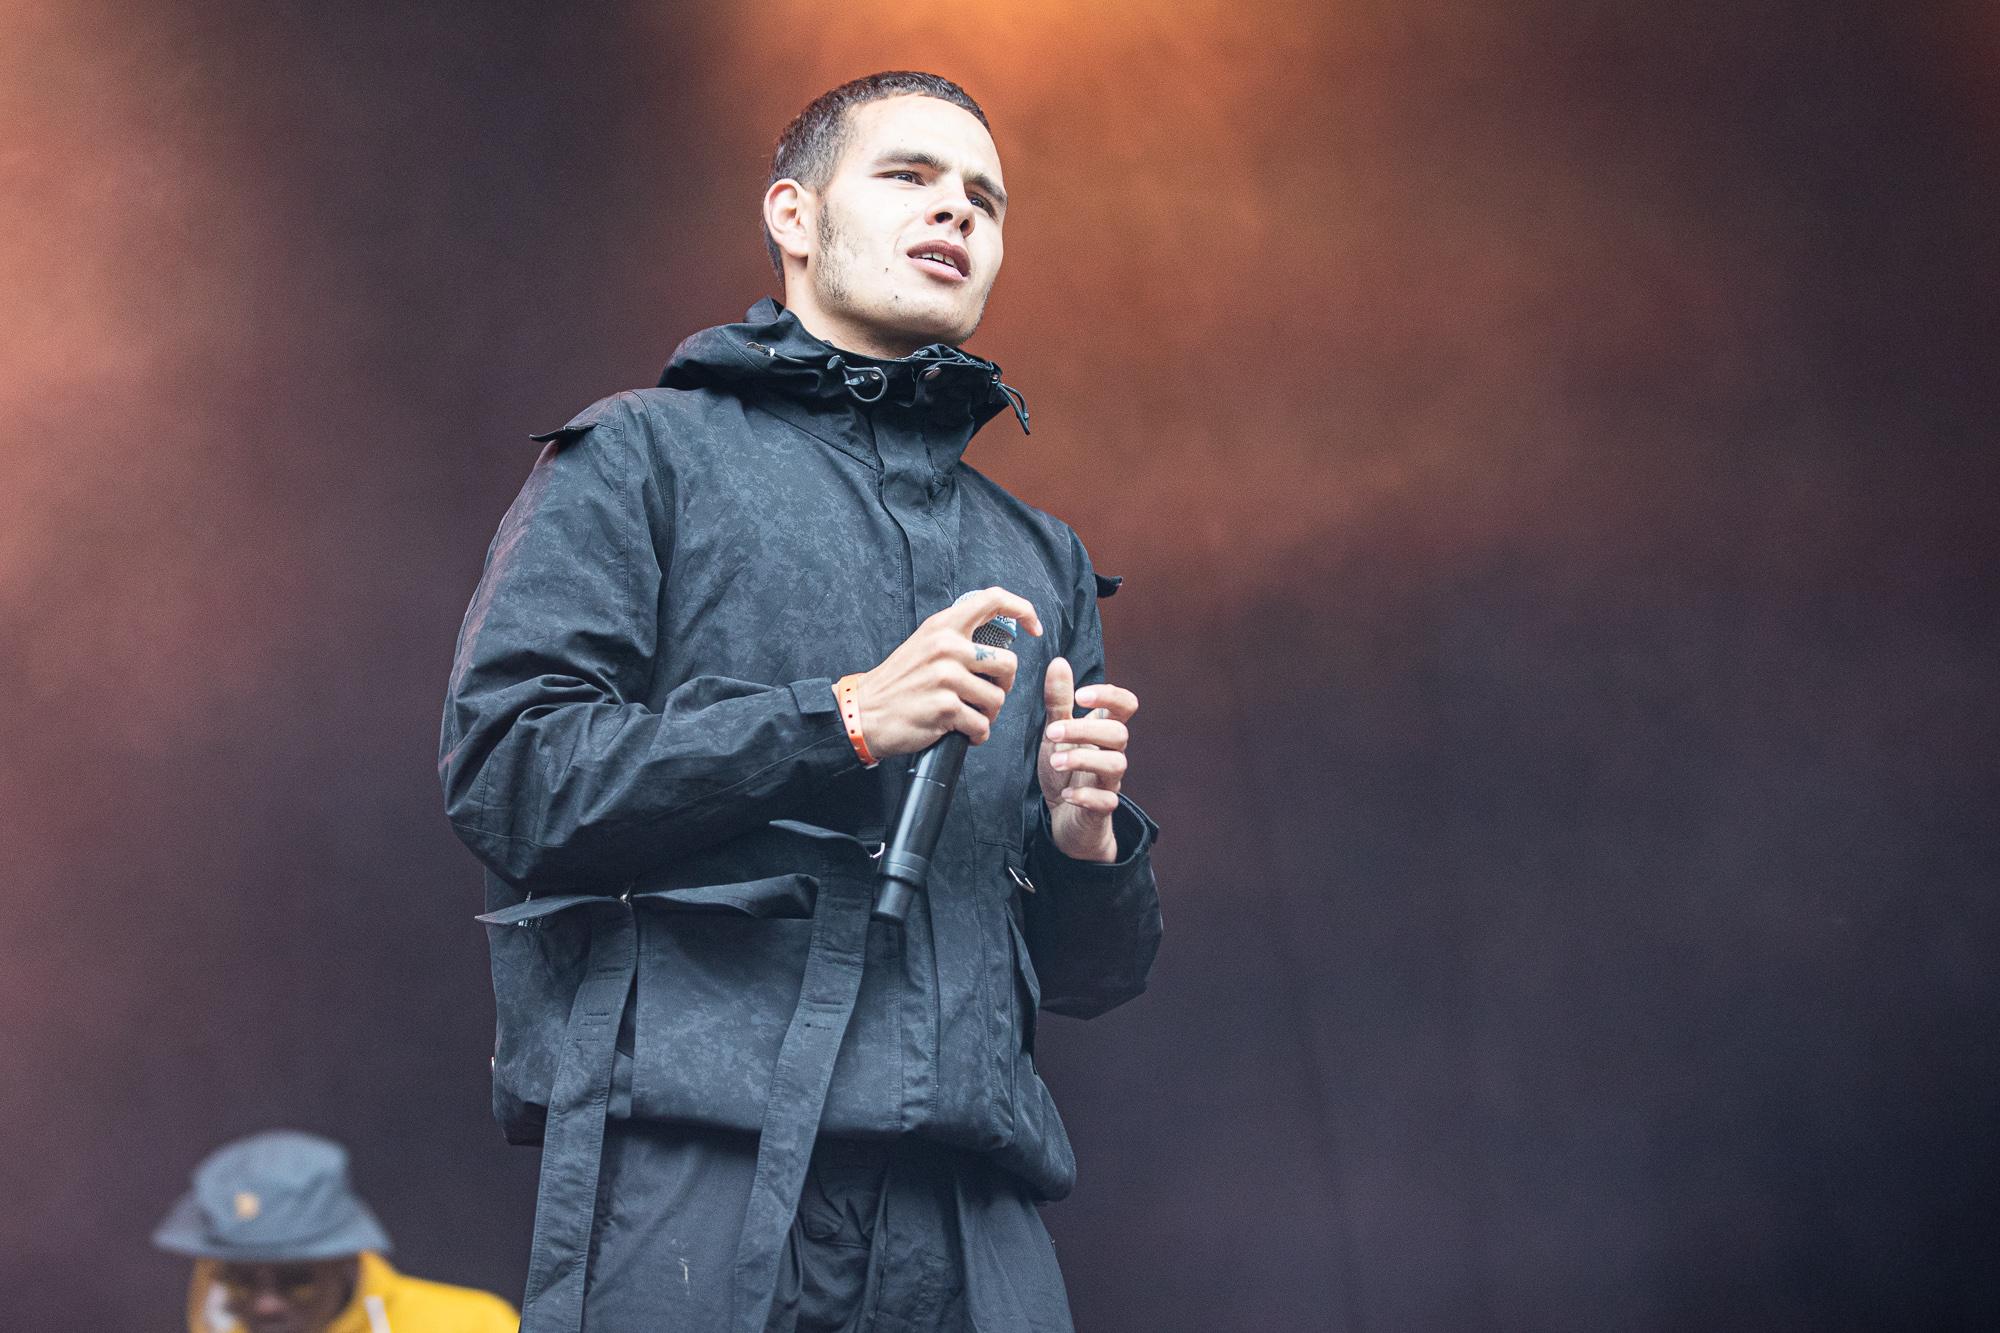 Slowthai @ Øyafestivalen 2019